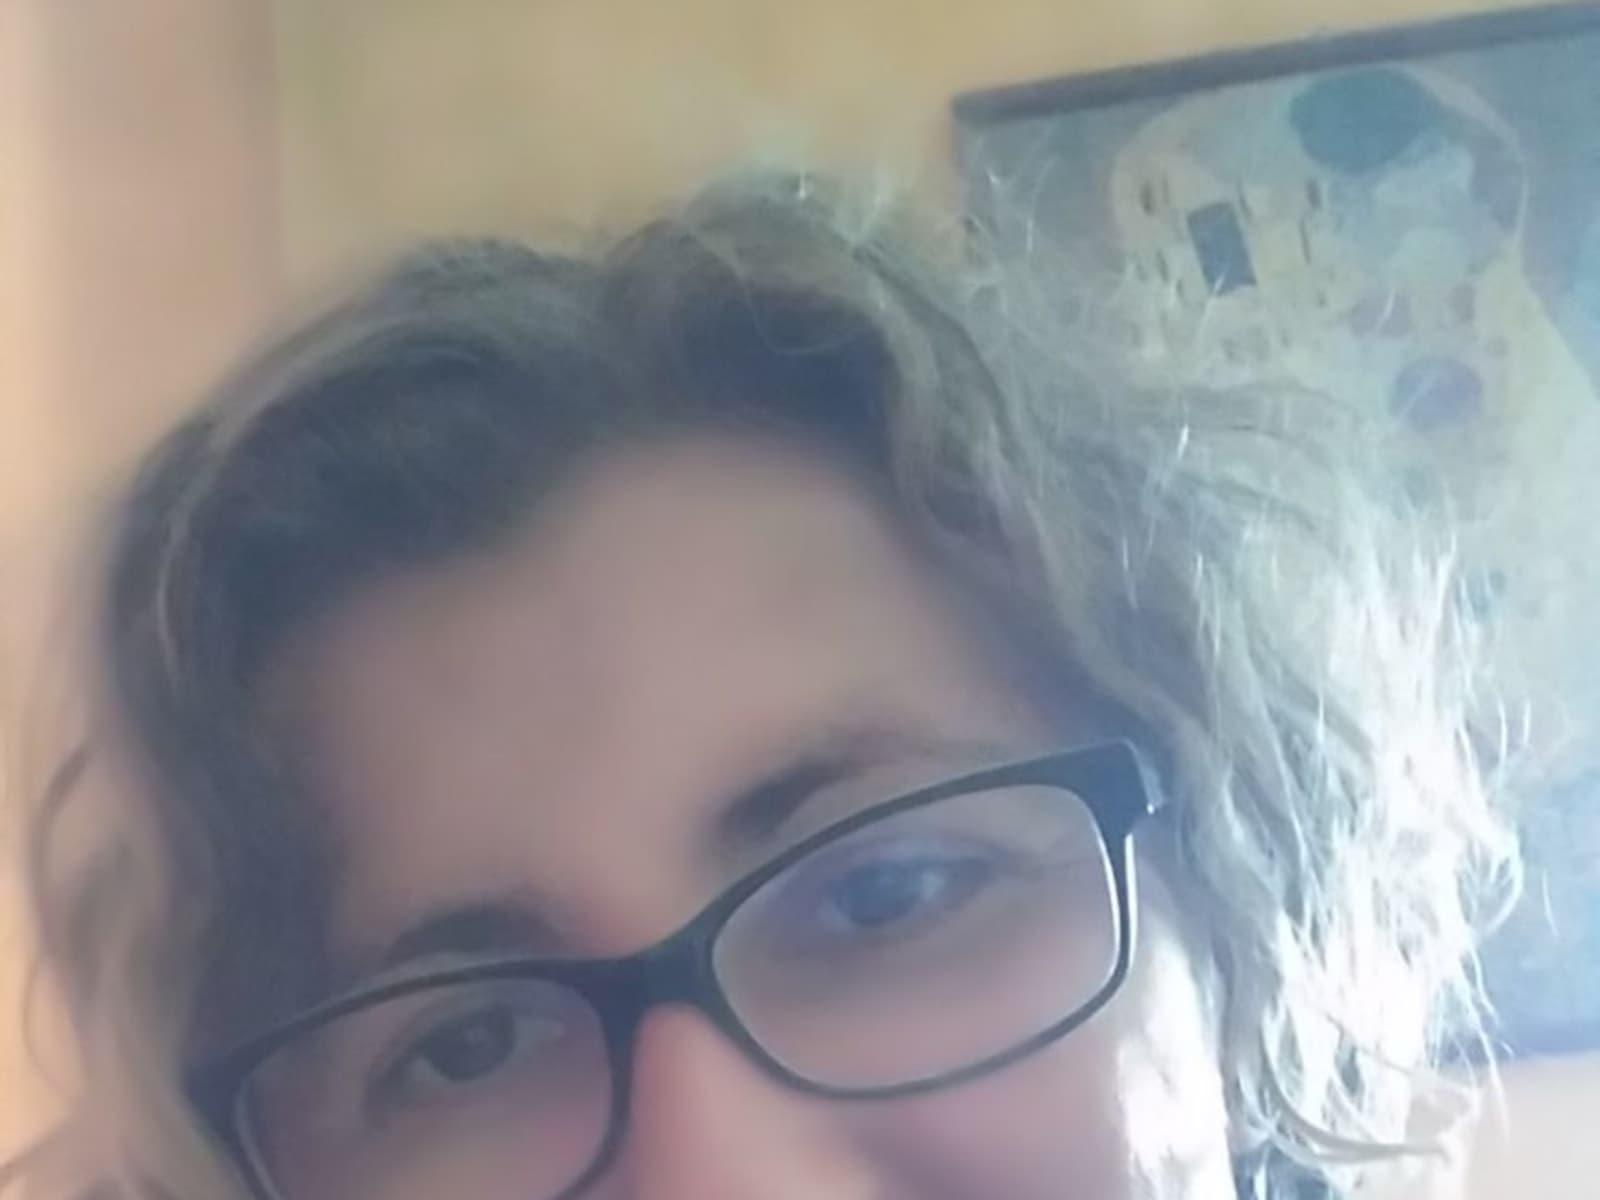 Mirjana from Osijek, Croatia